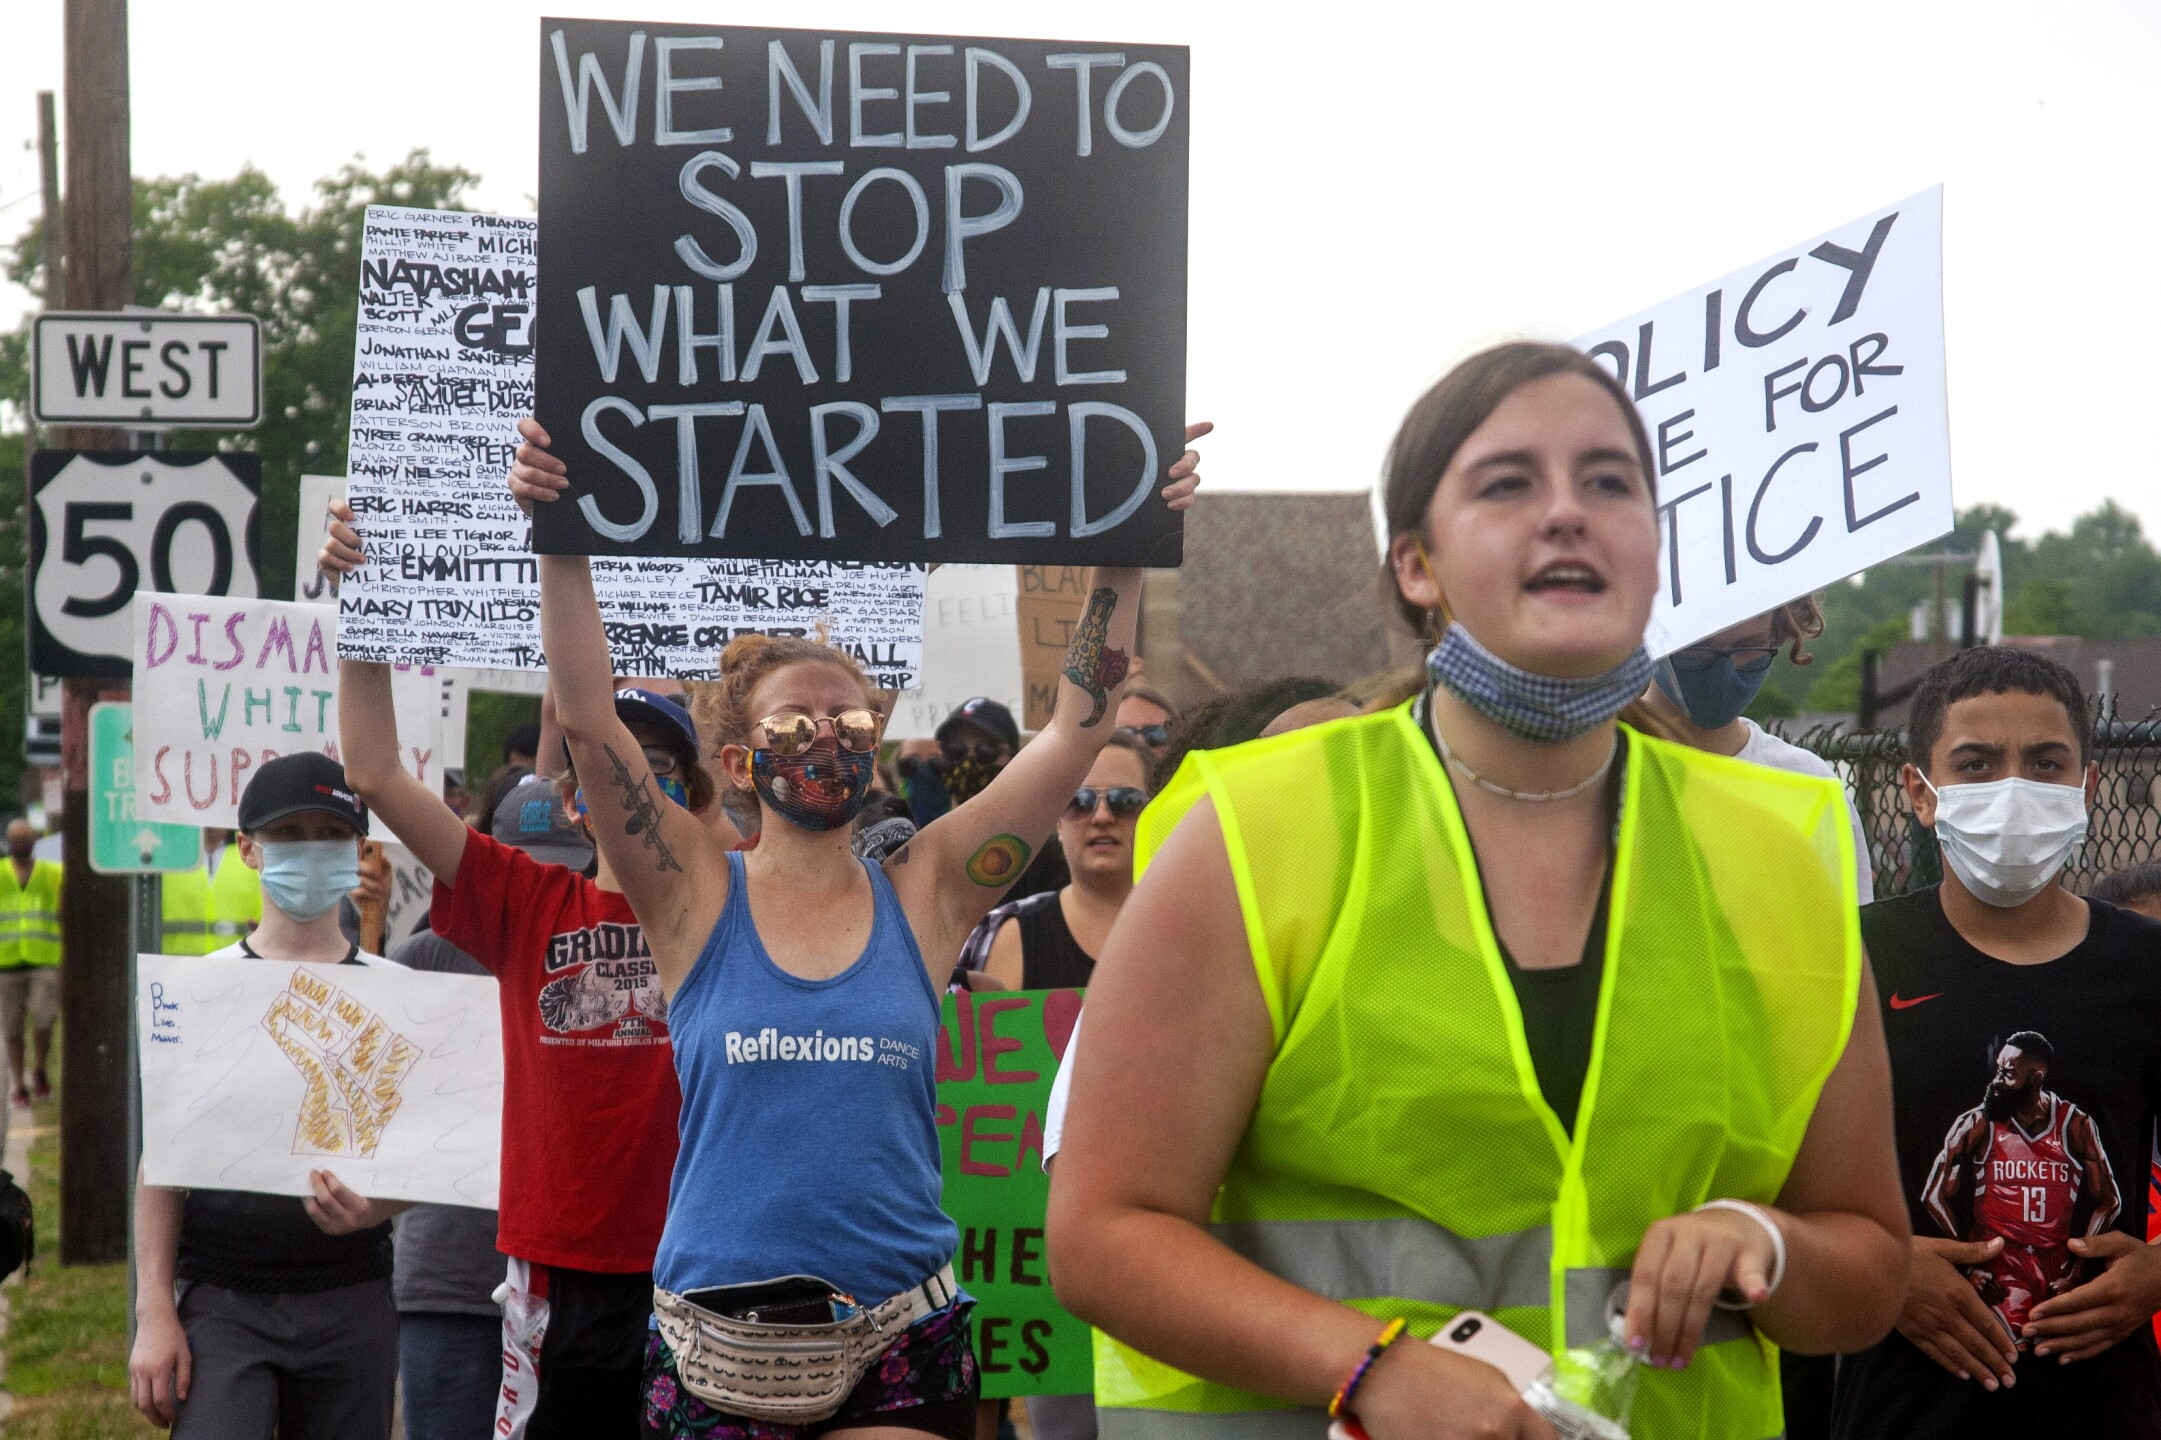 062020_milfordprotest19.jpg